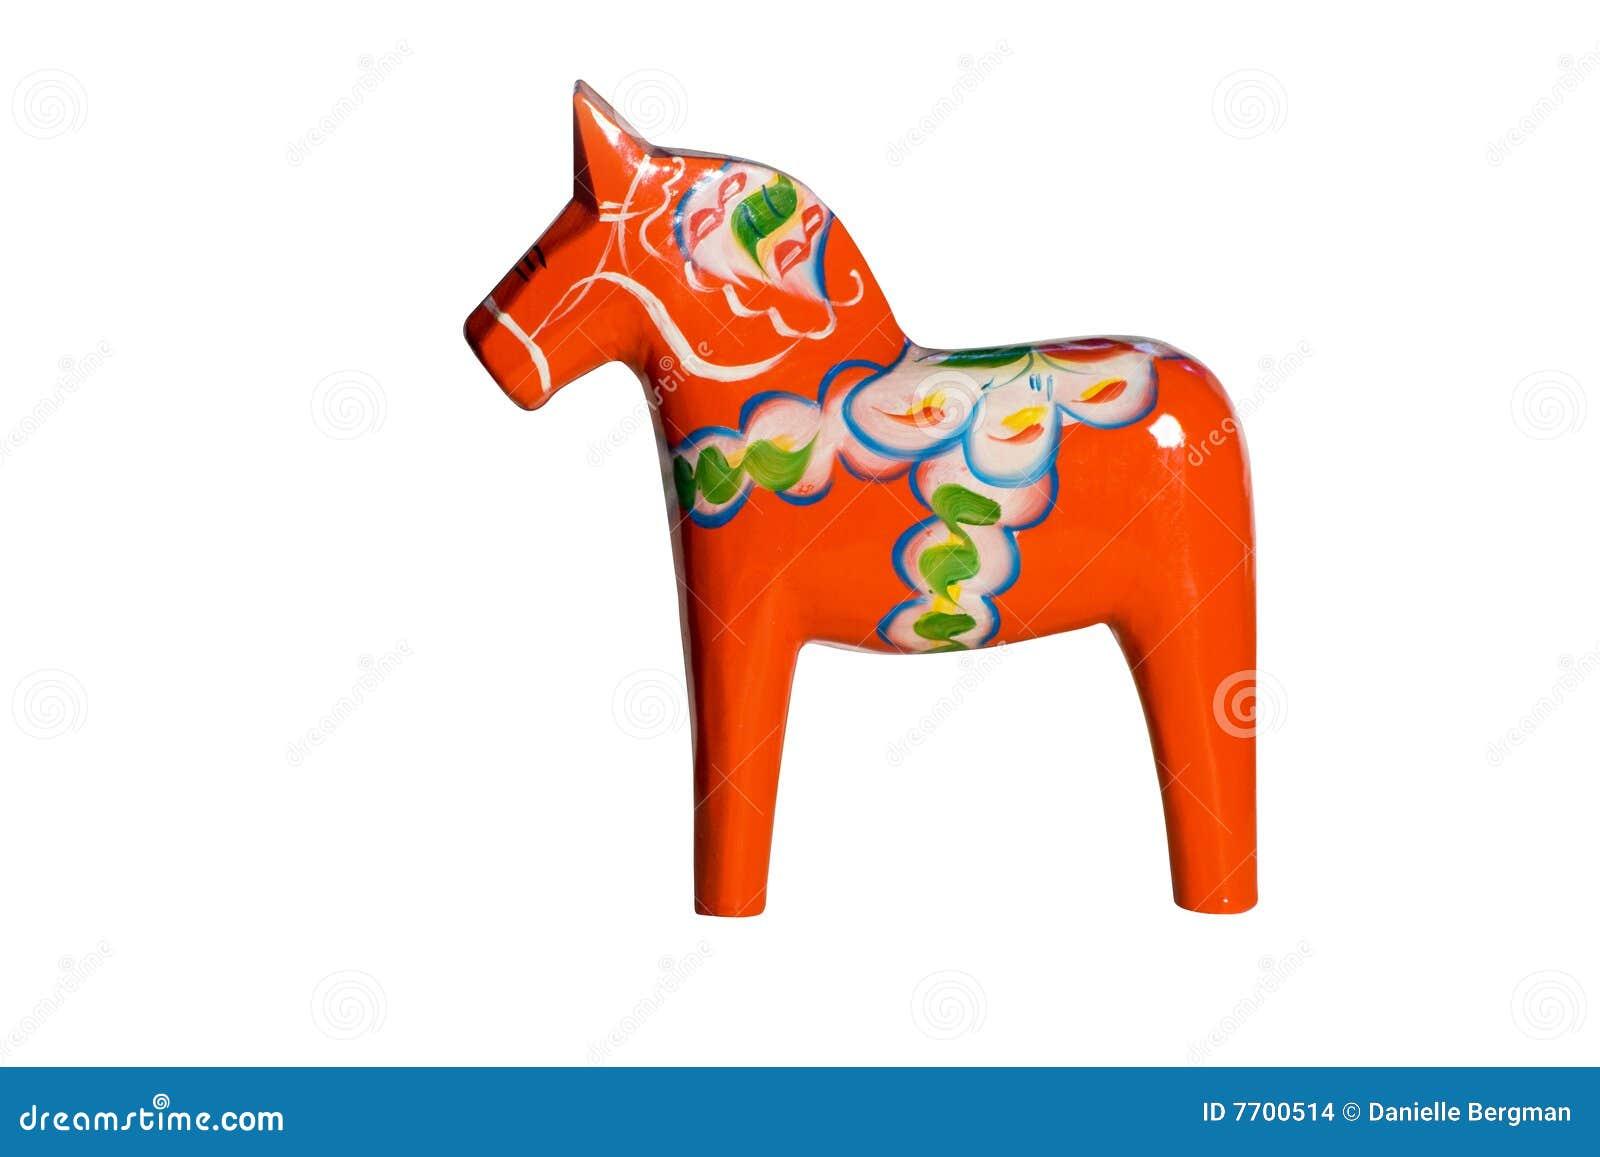 malvorlage dala pferd  28 images  dala pferd rot